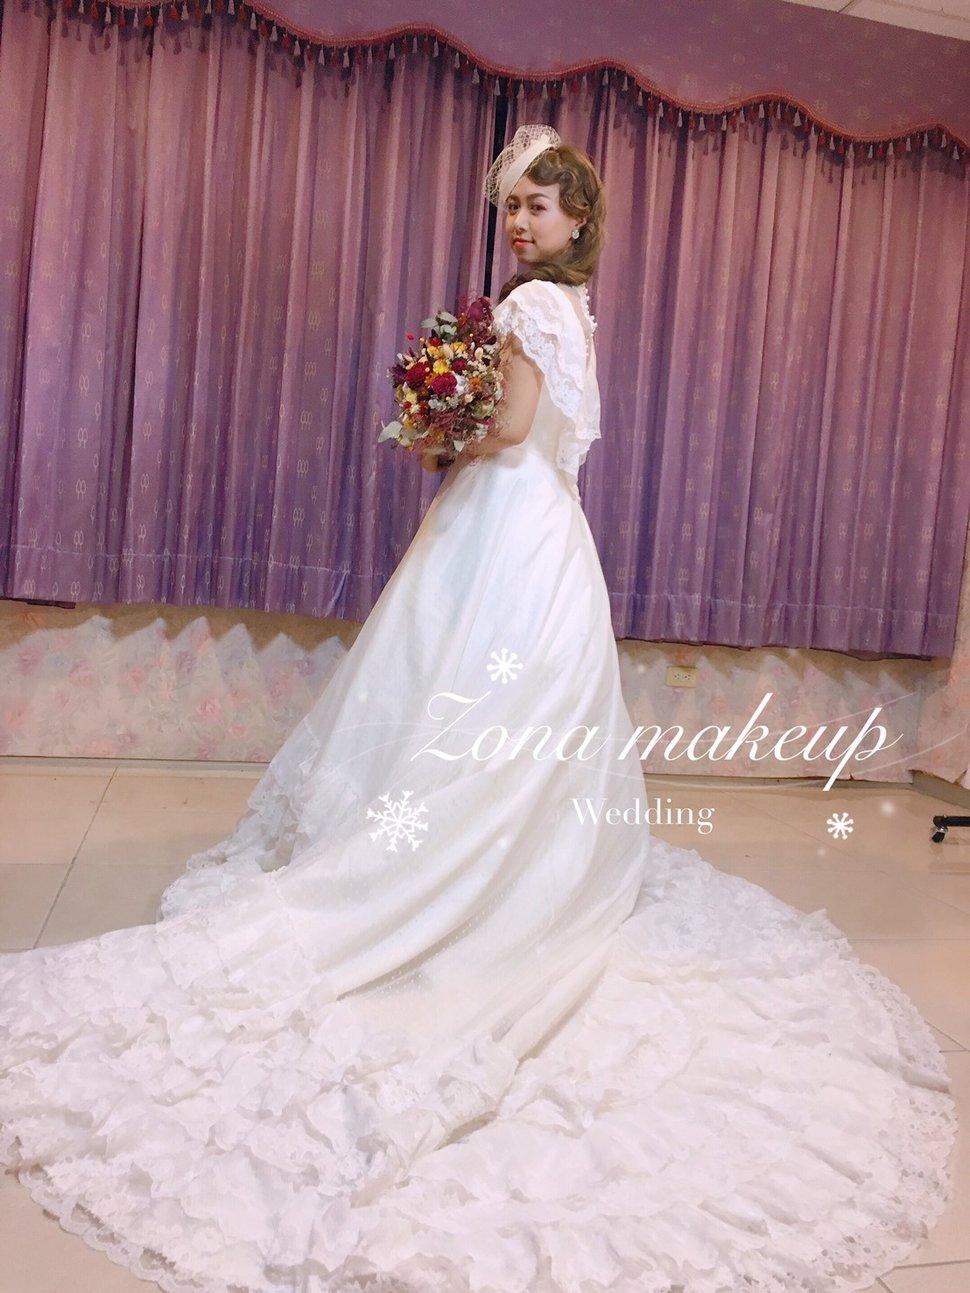 2019410_190410_0085 - Zona時尚美甲x新娘秘書整體造型工作室《結婚吧》